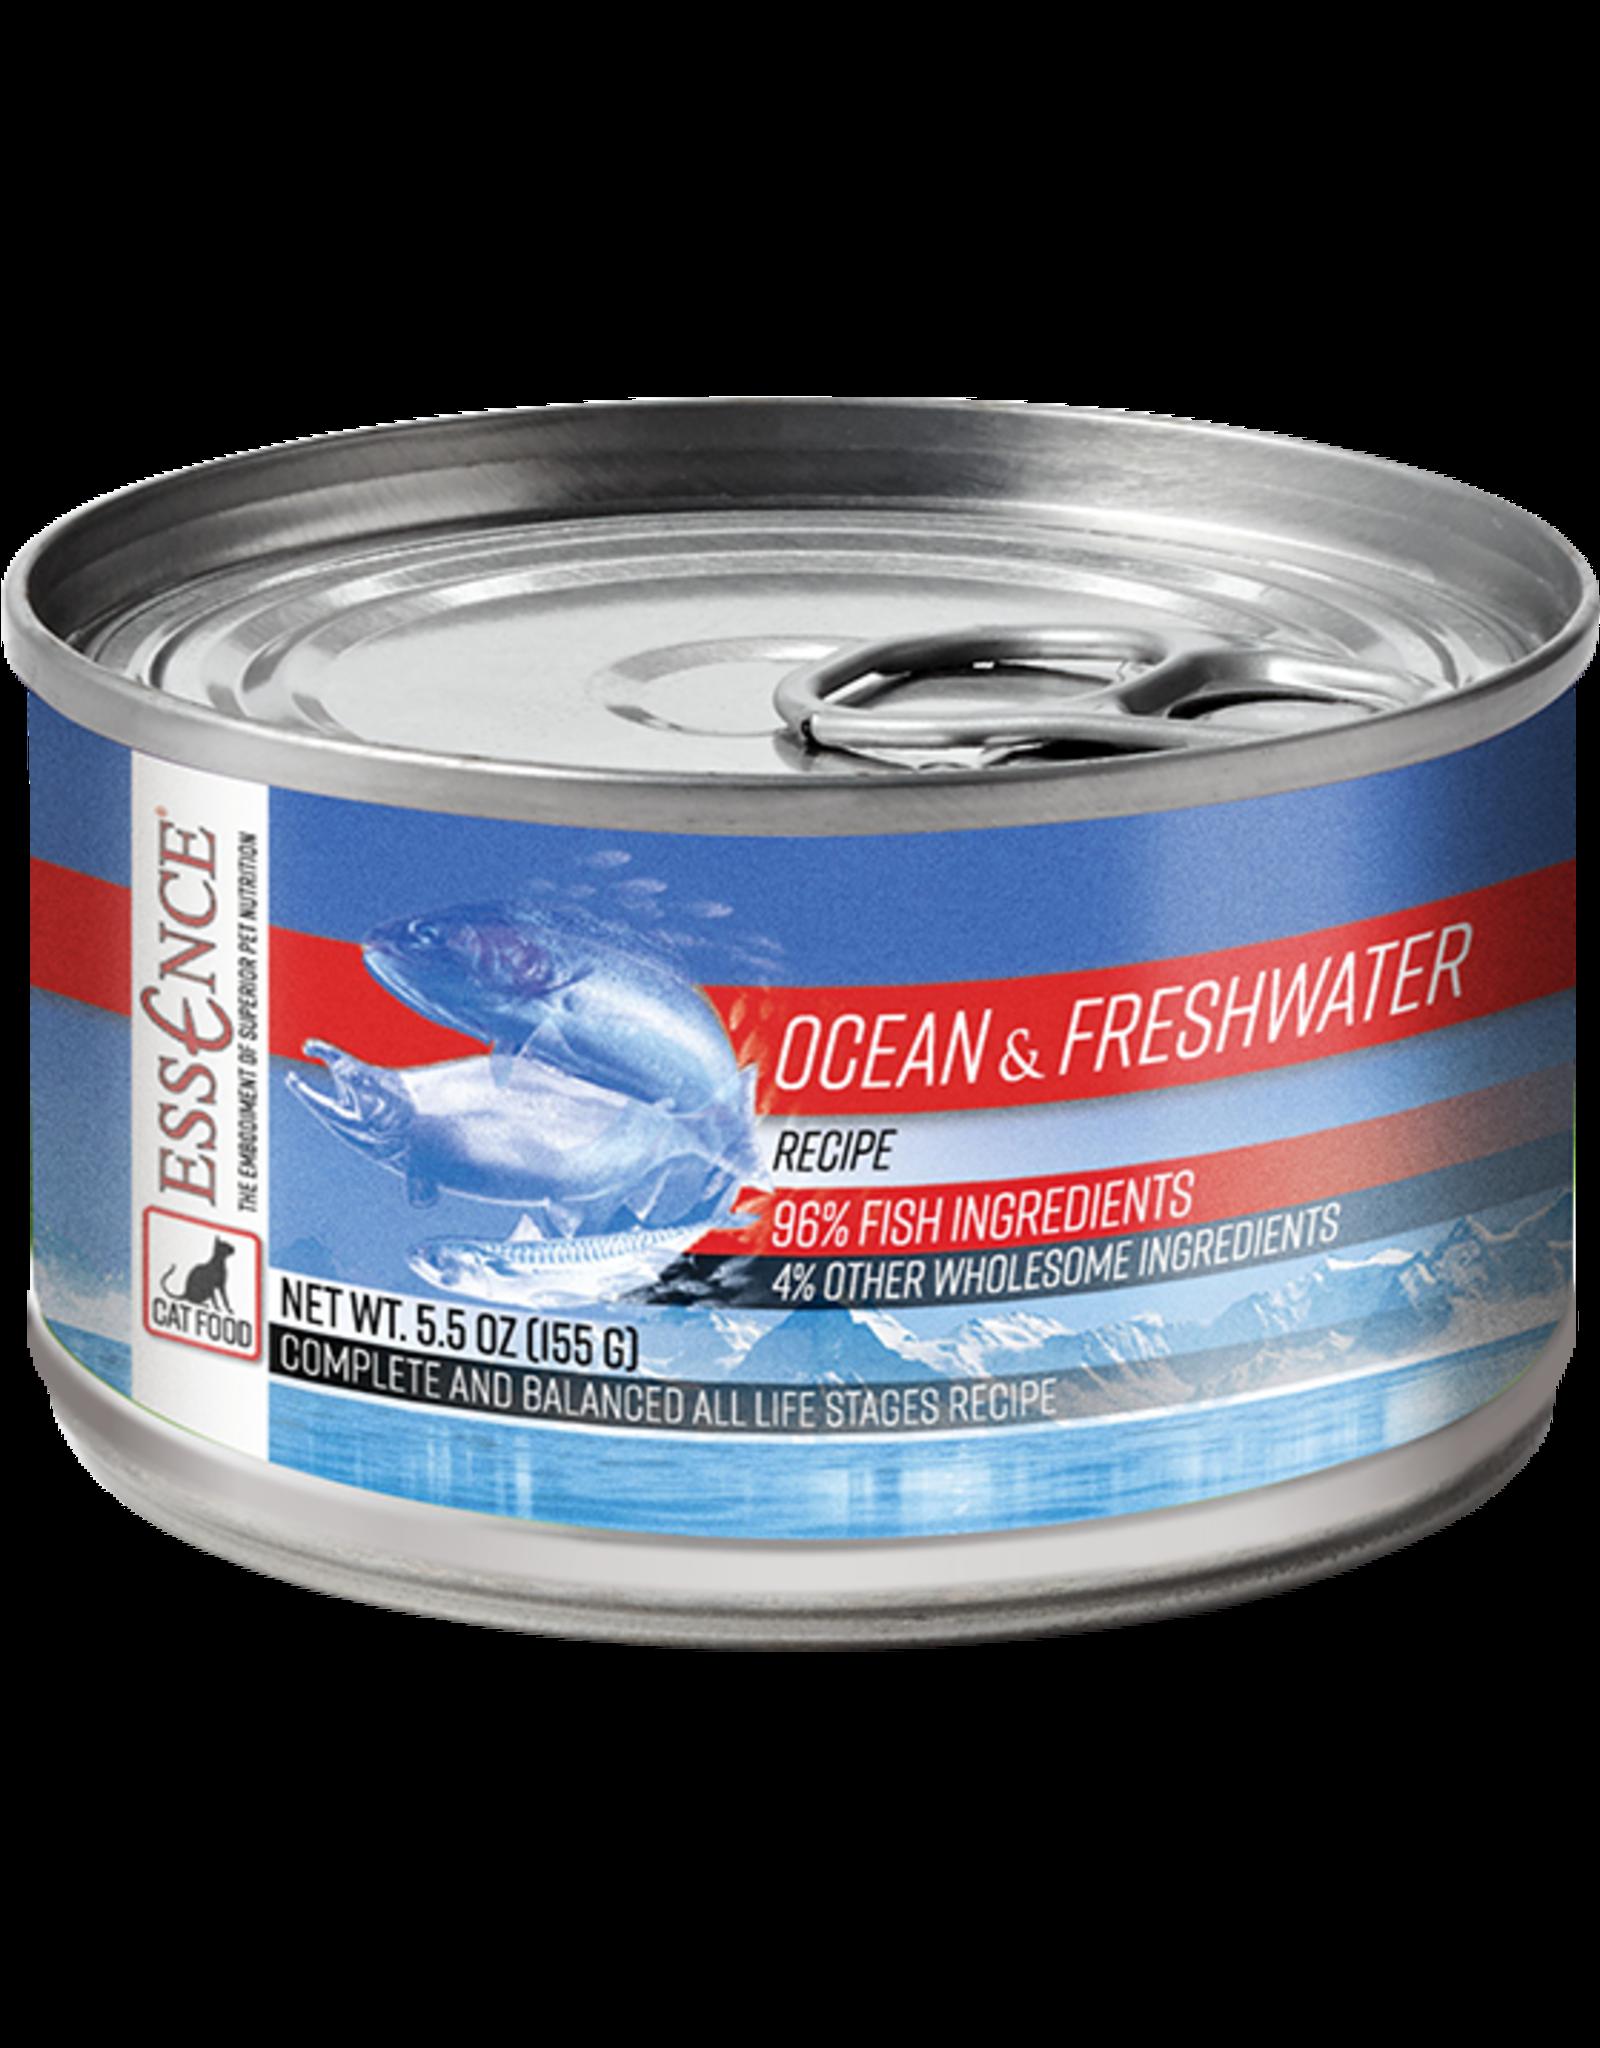 Essence Essence Ocean & Freshwater Recipe Cat Food 5.5oz